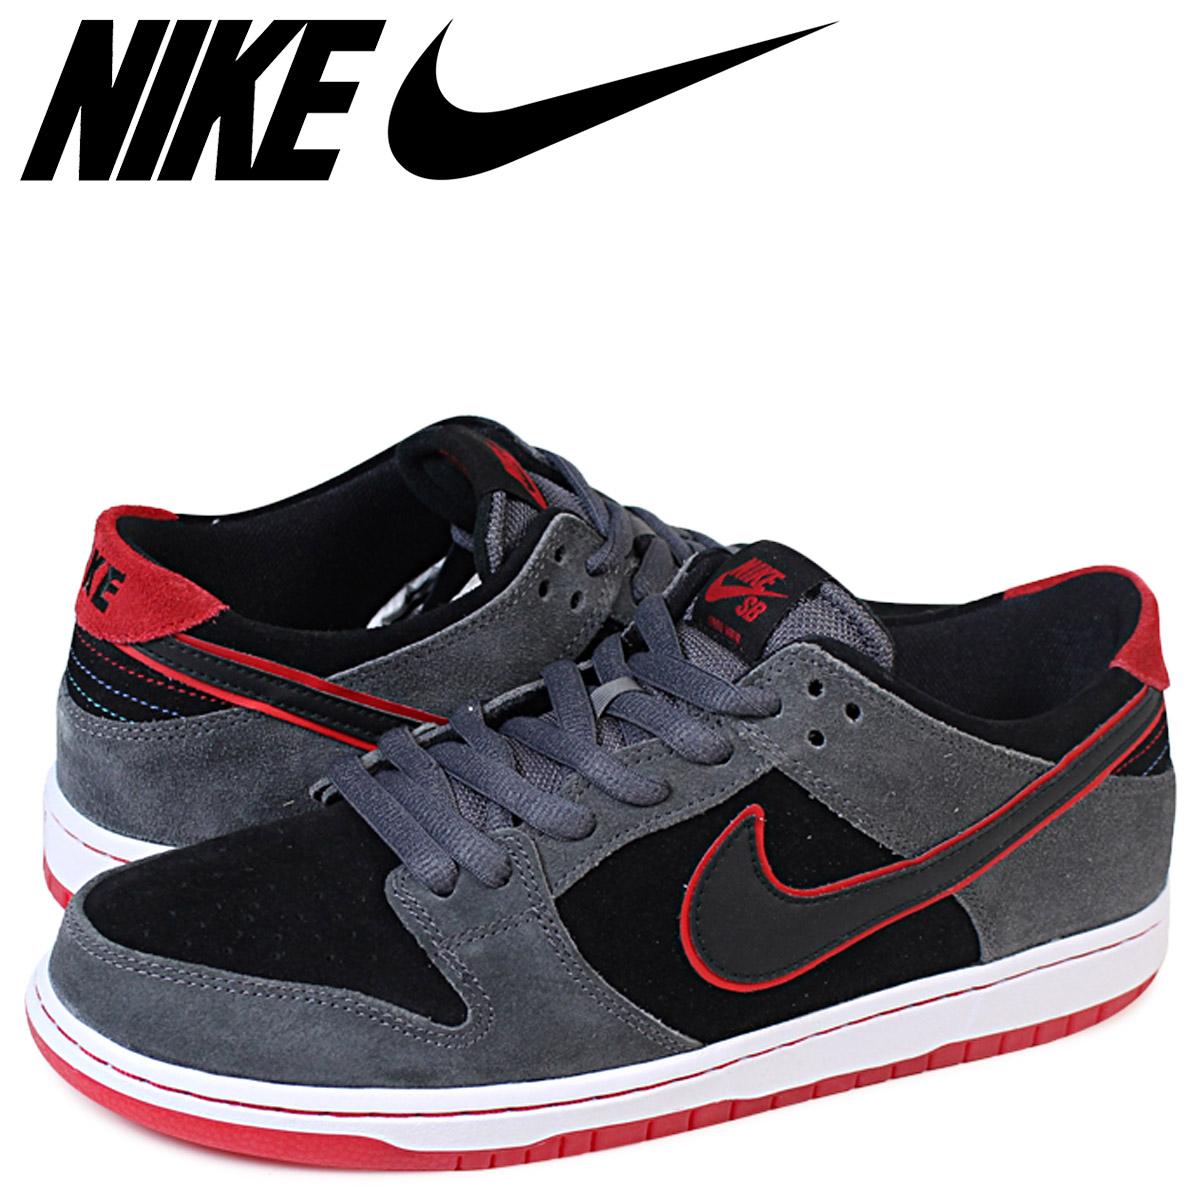 huge discount 8ae72 969d5 NIKE SB Nike dunk sneakers men DUNK LOW PRO ISHOD WAIR 895,969-006 gray